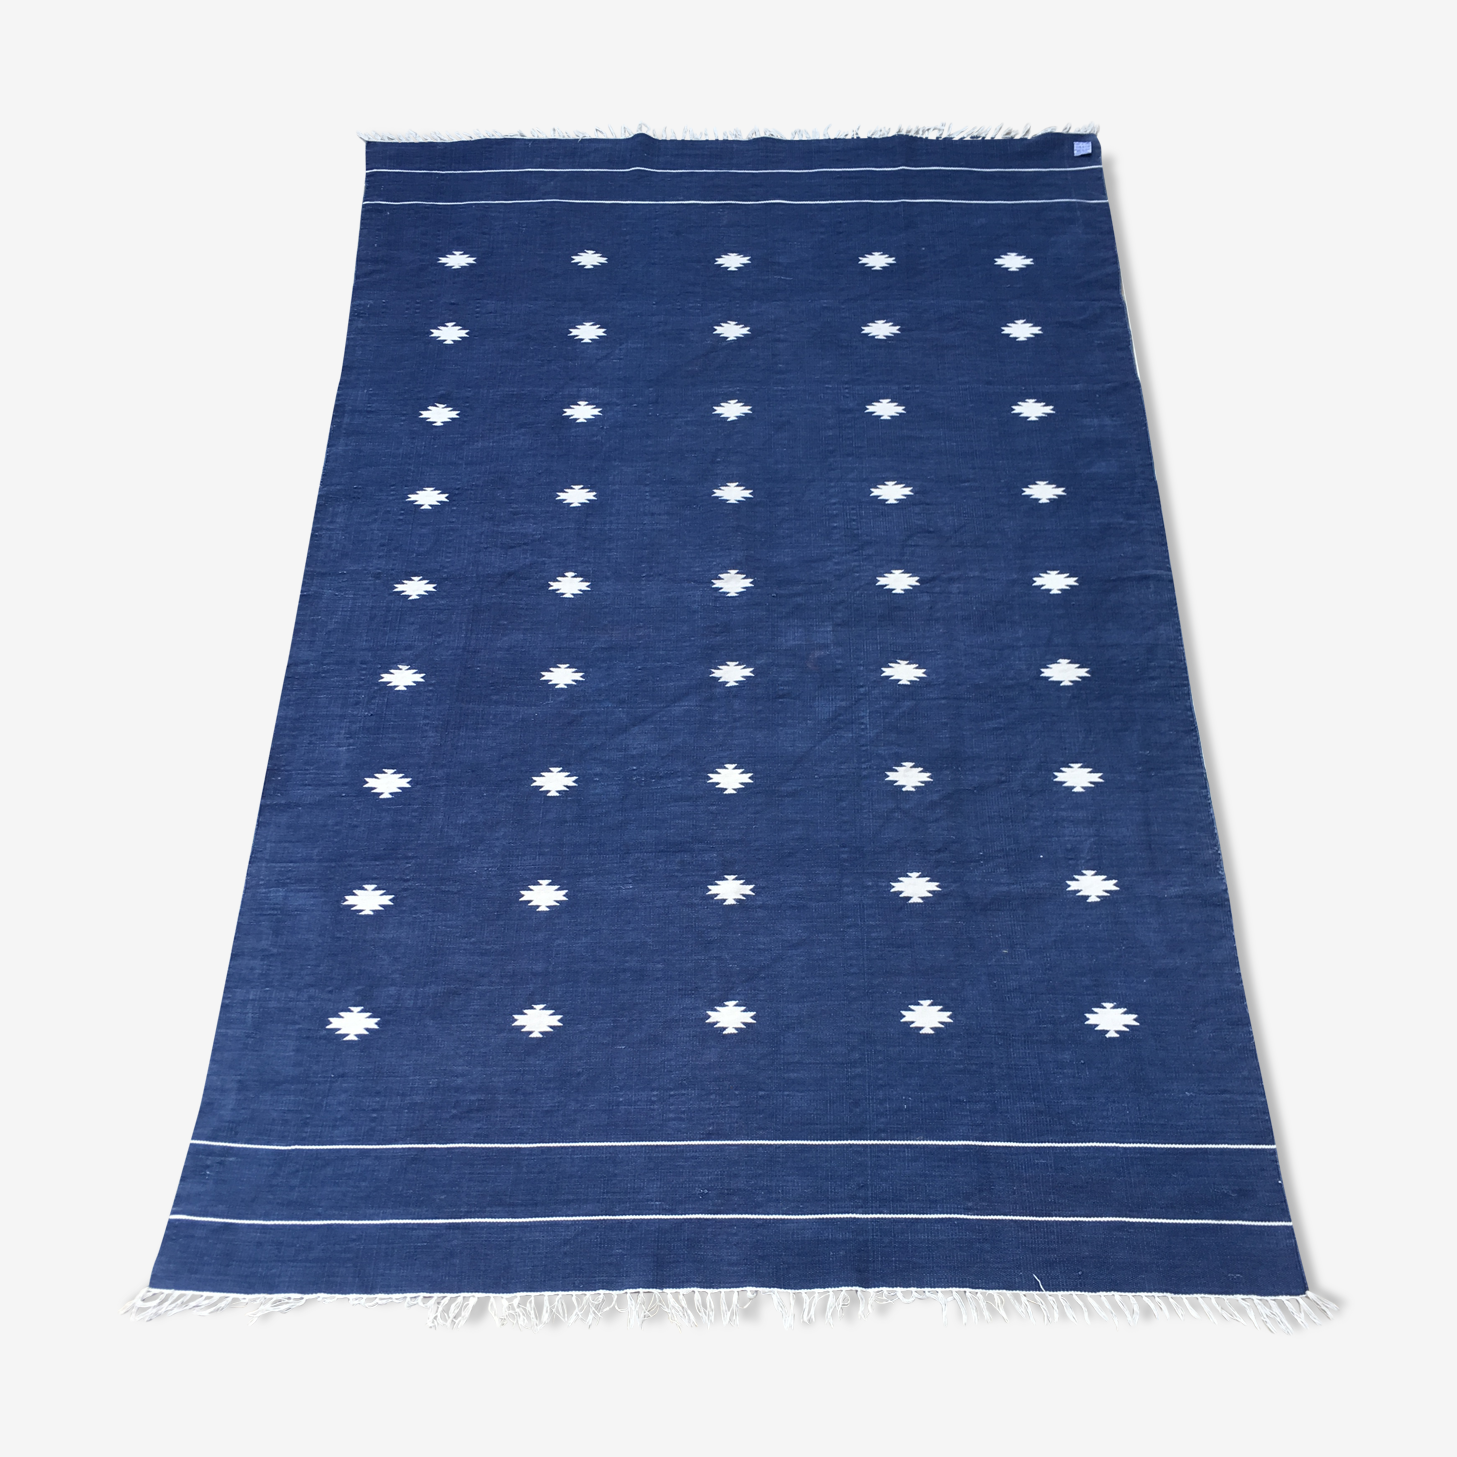 Tapis kilim 100% coton 165x262cm